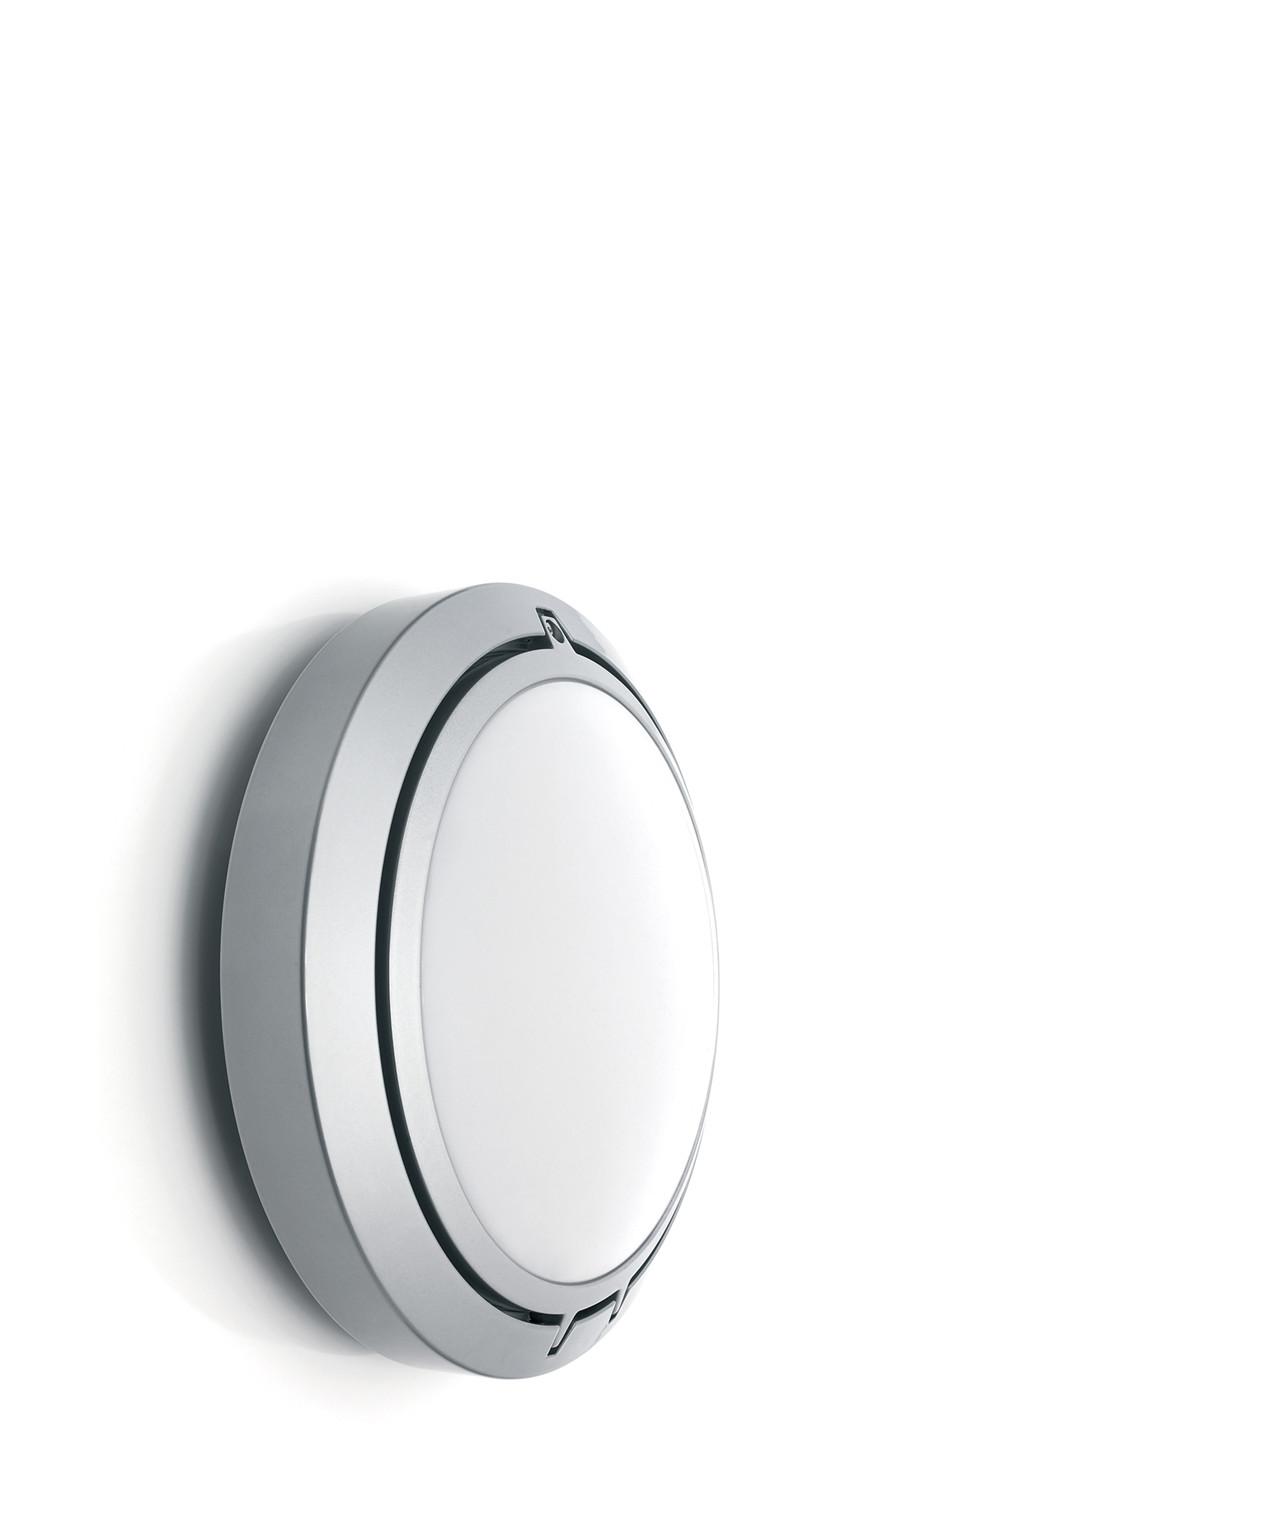 N/A – Metropoli væglampe/loftlampe glas Ø38 - luceplan fra lampemesteren.dk